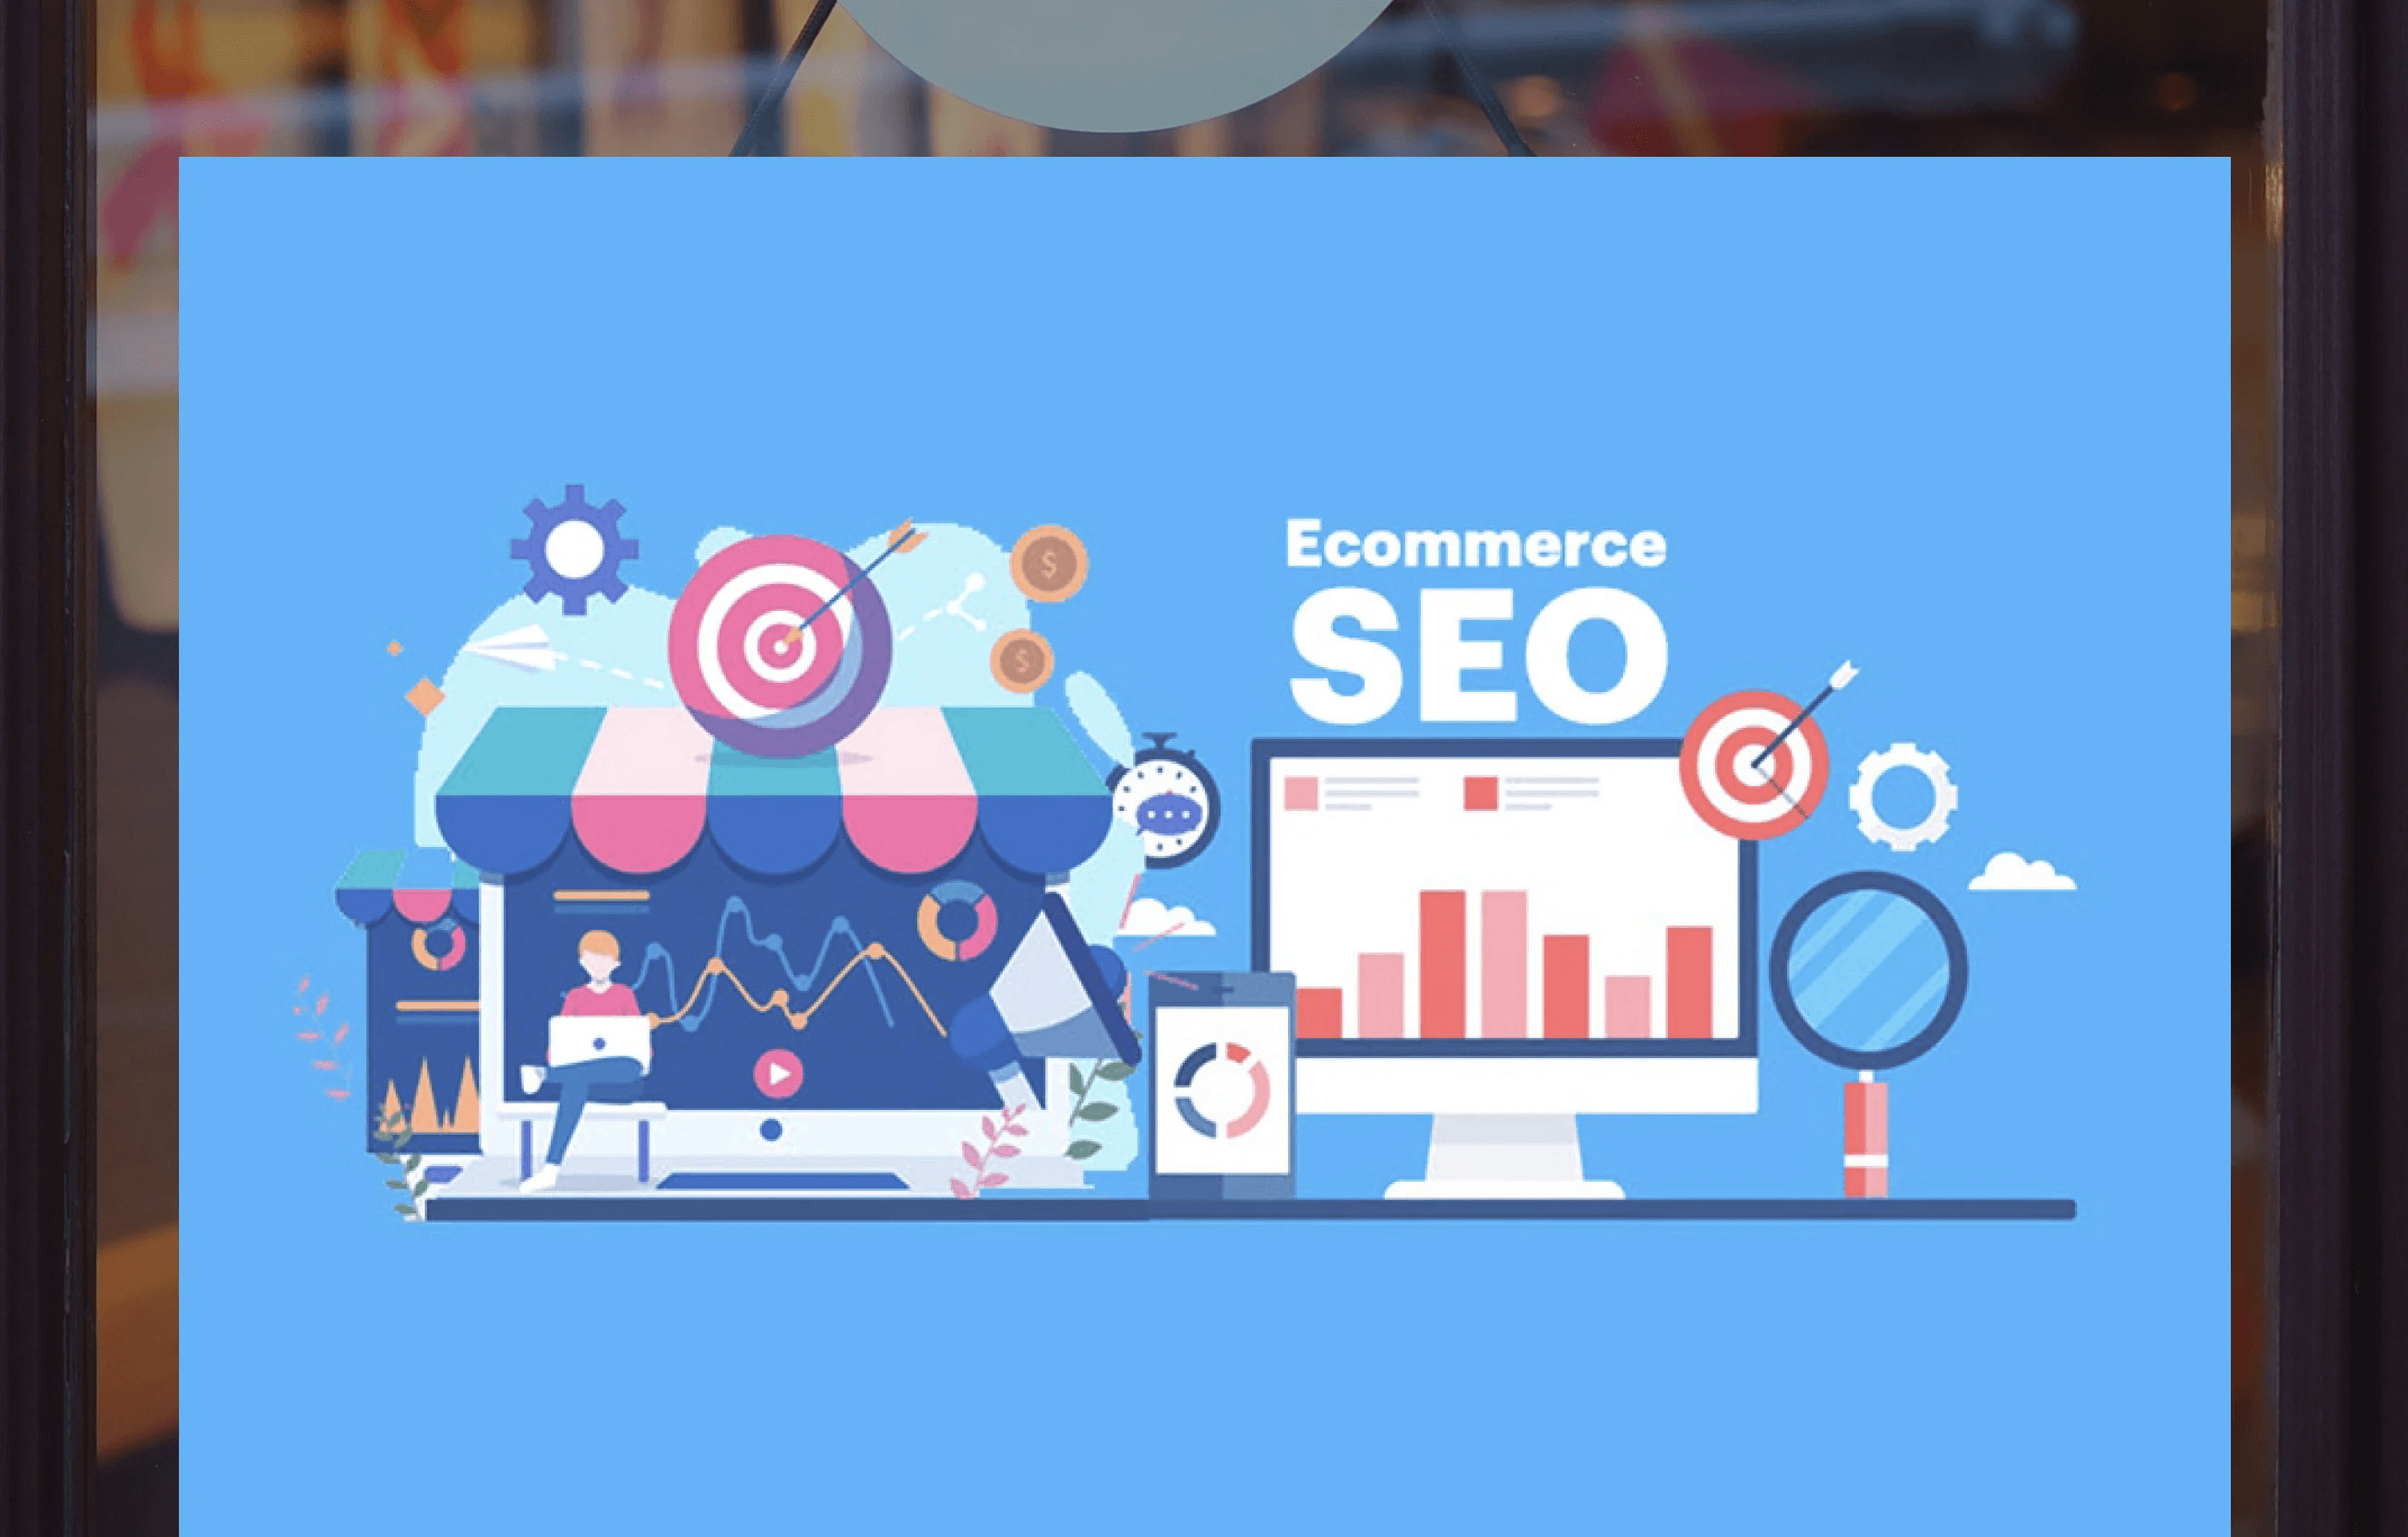 E-commerce SEO Services | The Creative Momentum Atlanta, GA Web Design & Digital Marketing